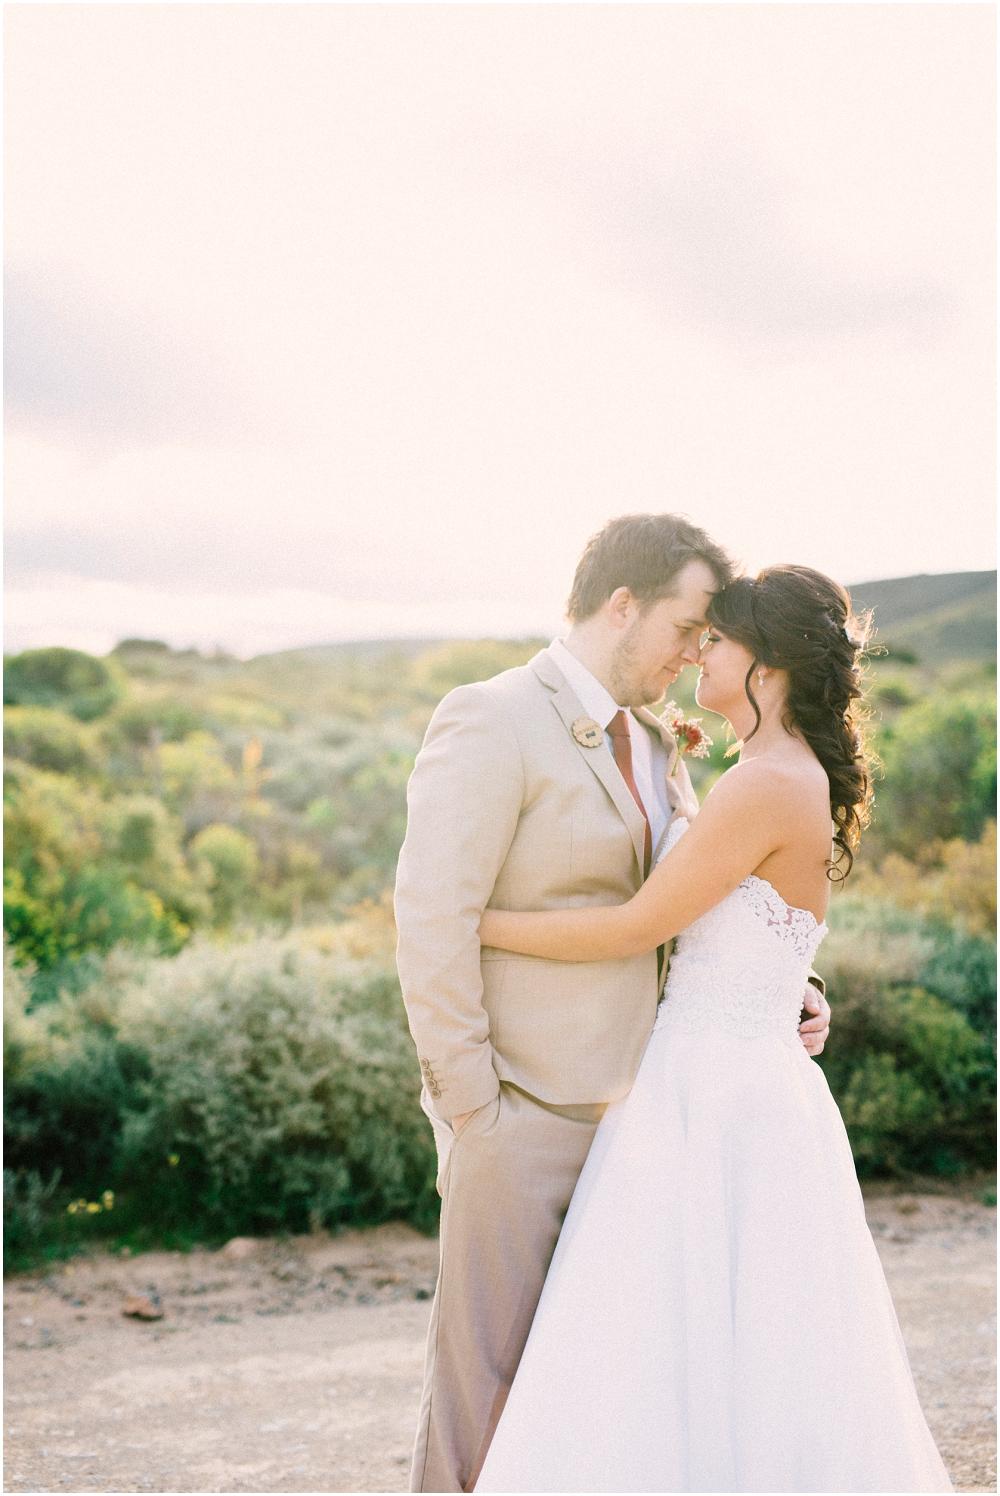 RonelKrugerPhotography_Kliplapa Wedding Photographer (66).jpg